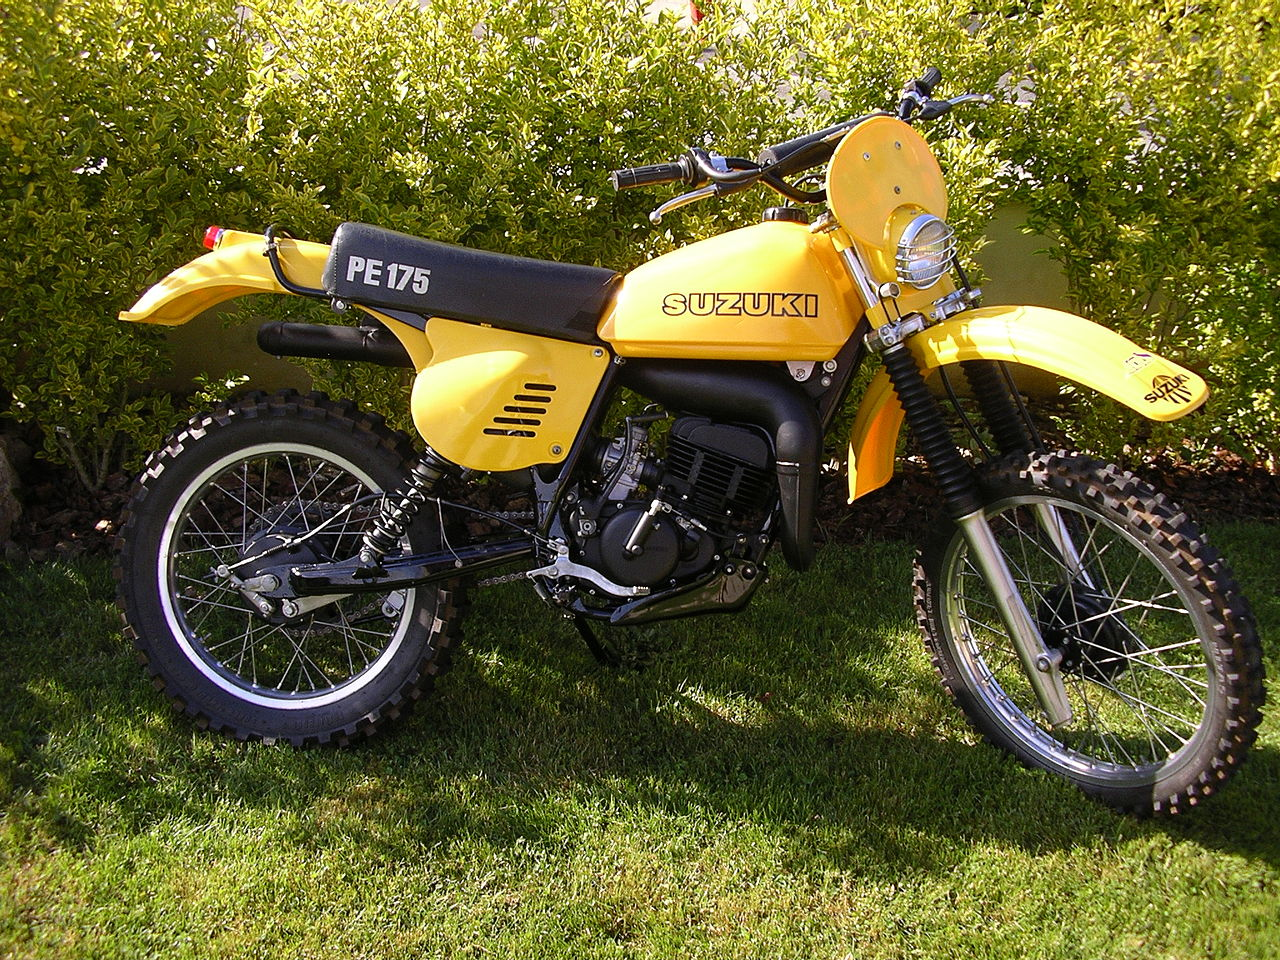 Suzuki Dirt Bike For Sale